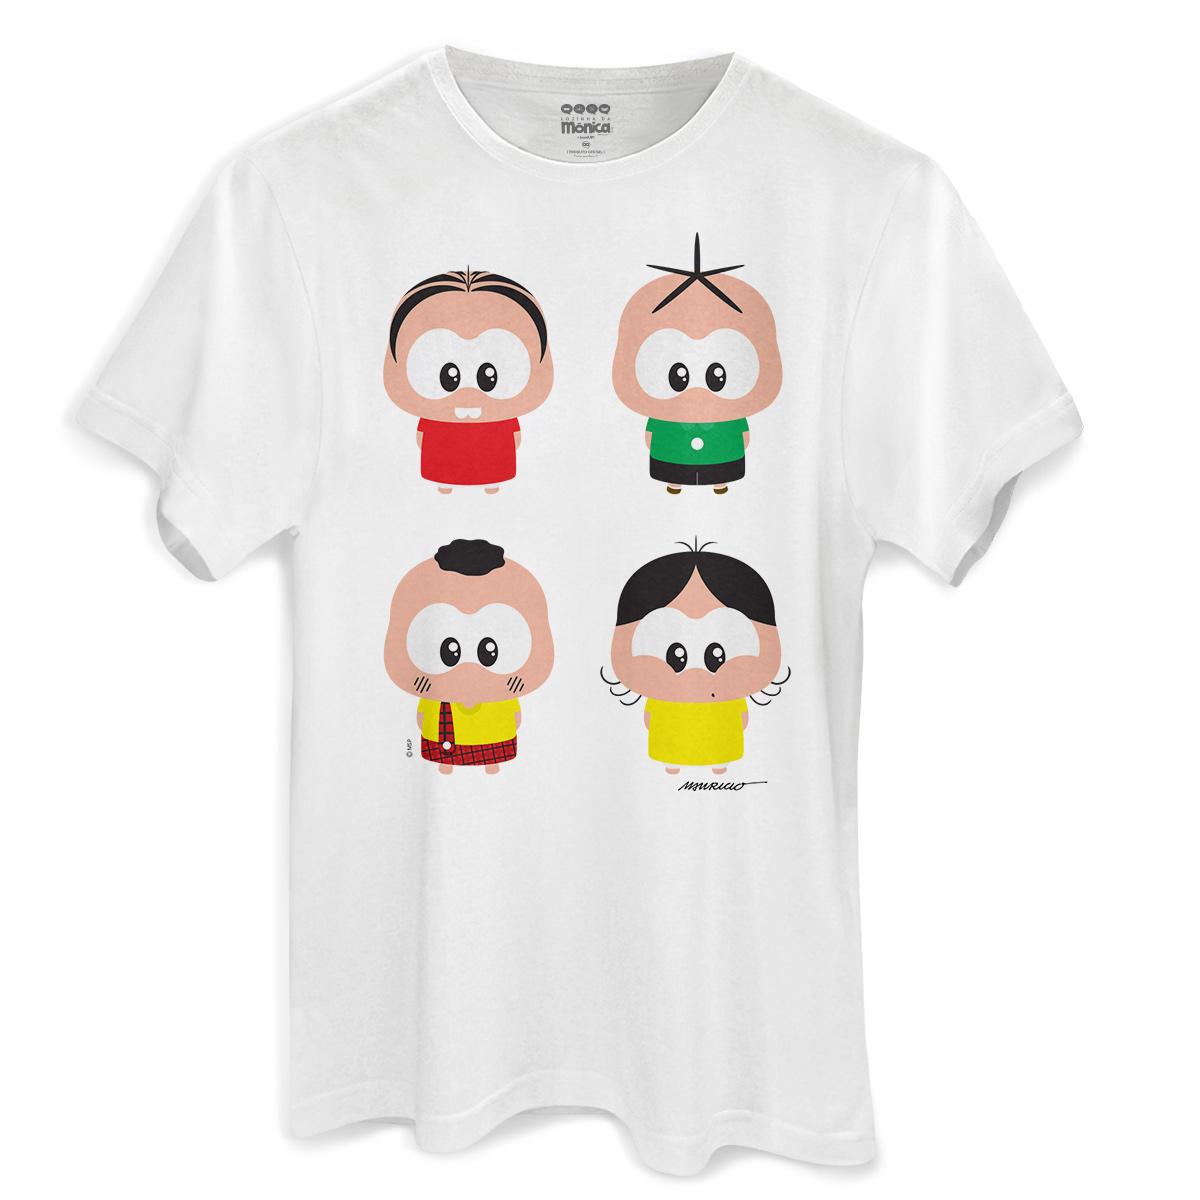 670bb06d72 Camiseta Masculina Turma da Mônica A Turma Toy